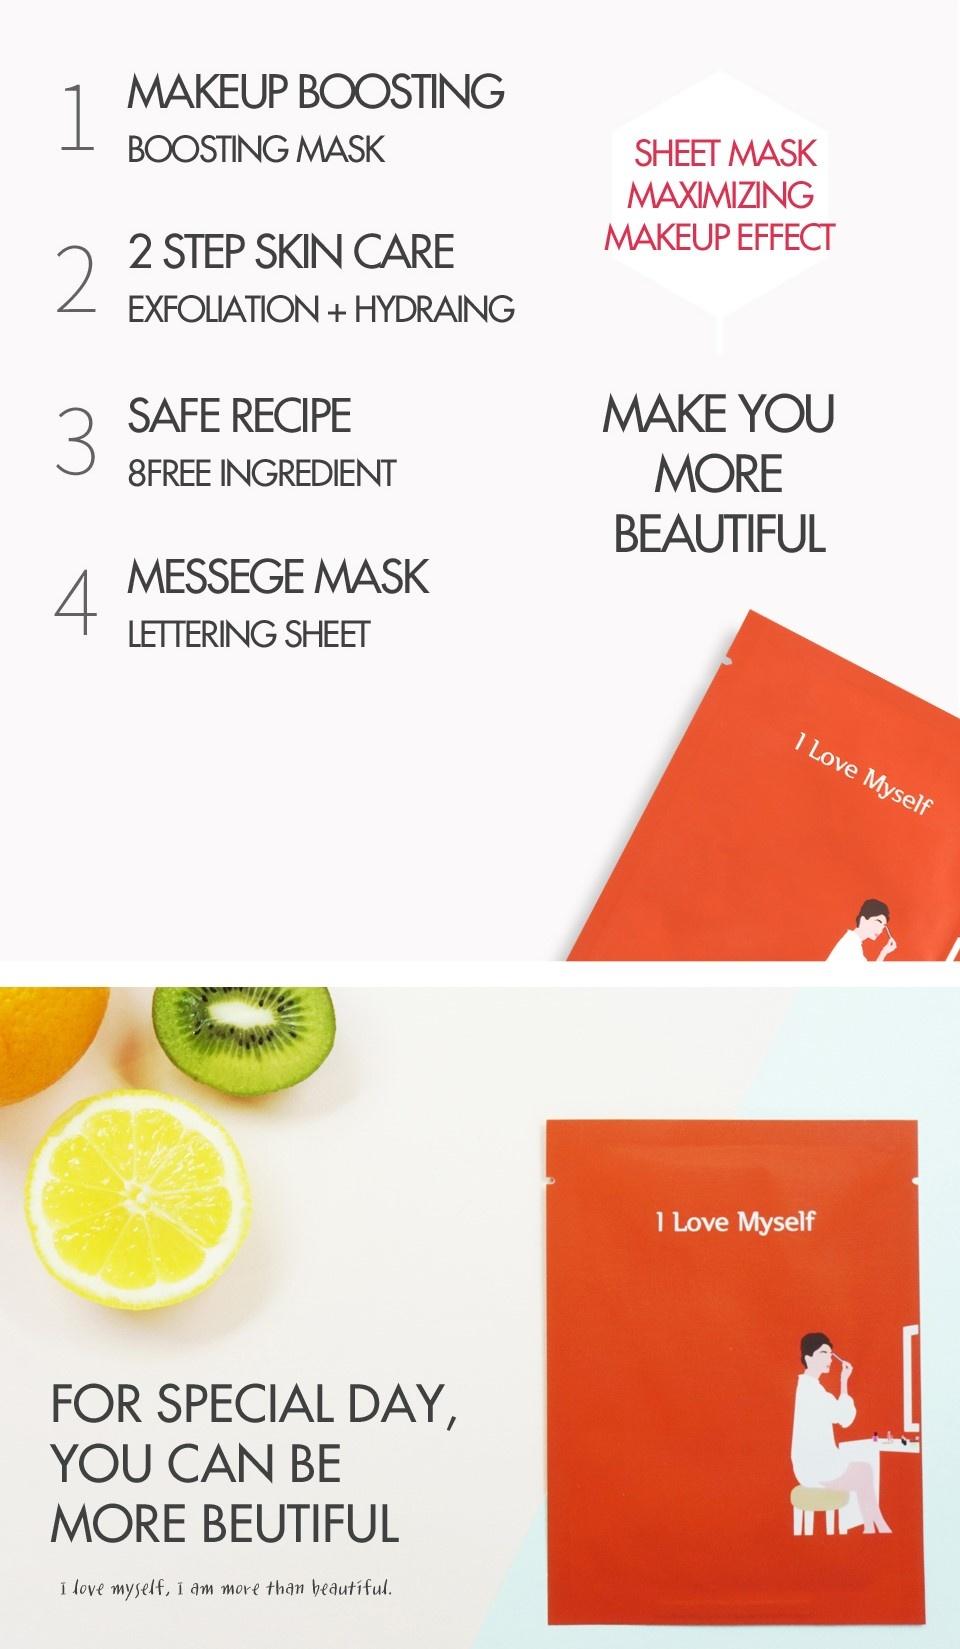 I LOVE MYSELF makeup boosting mask-5